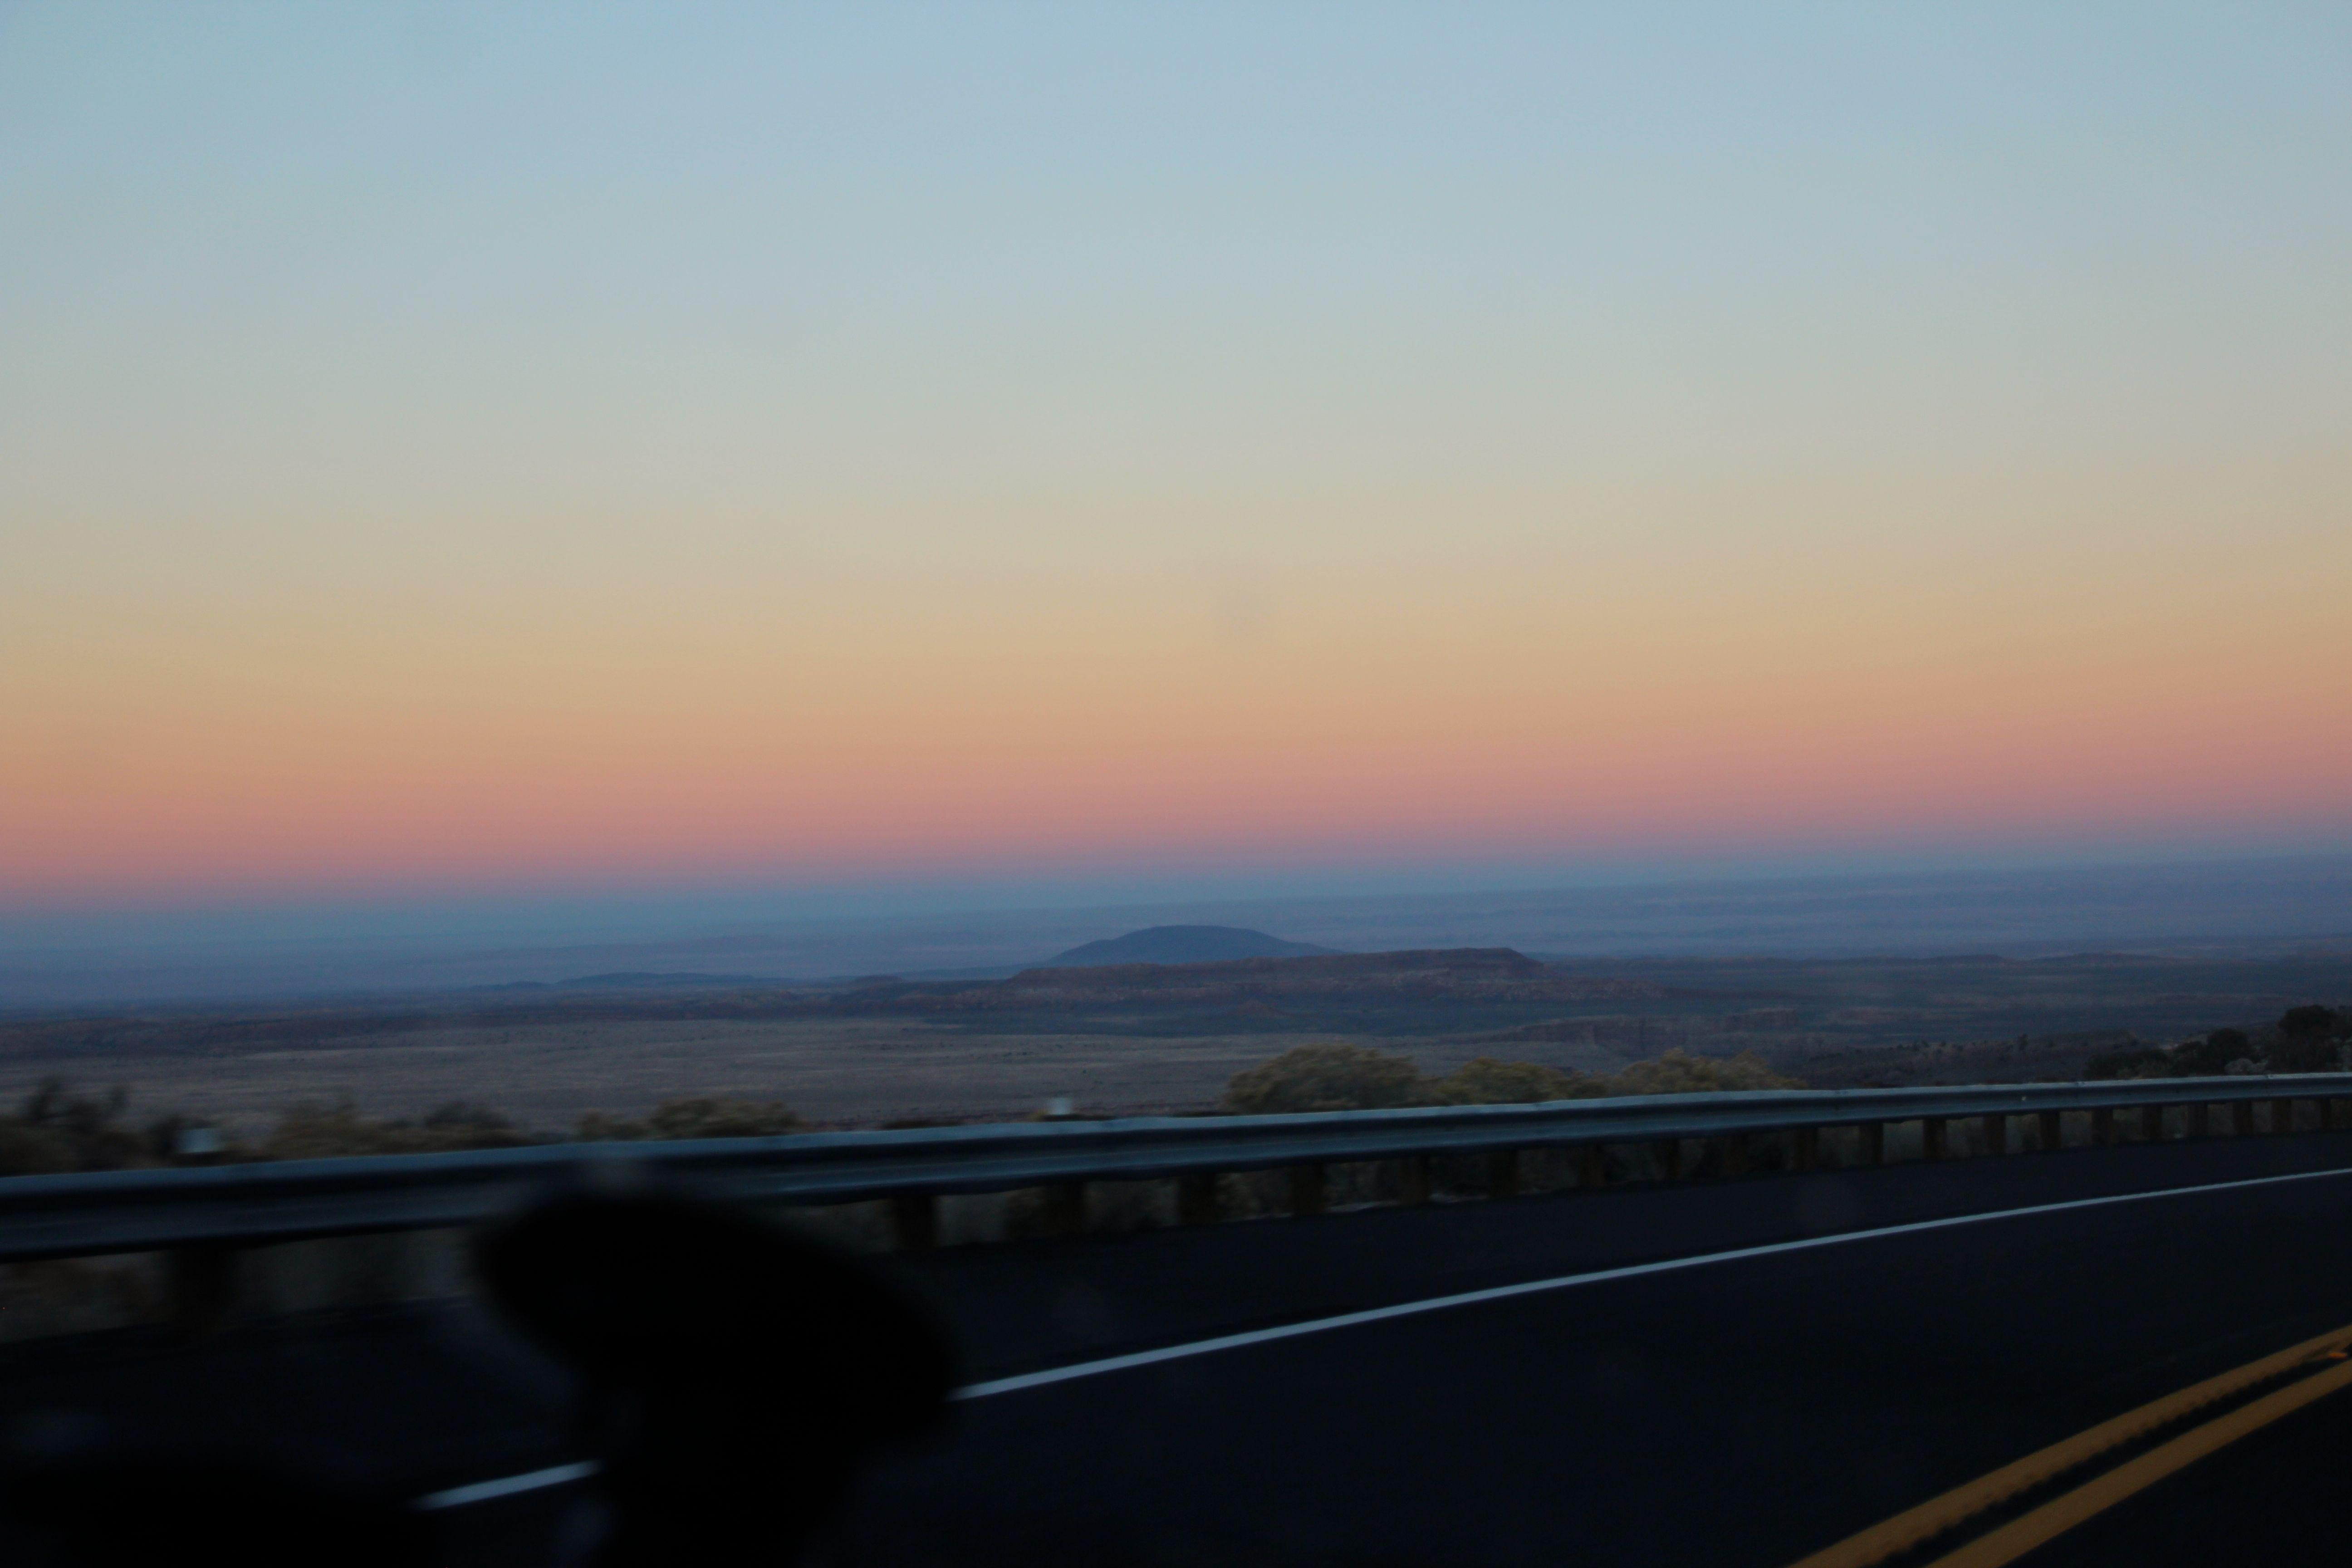 10 road trip sunset usa (c) upupup.fr